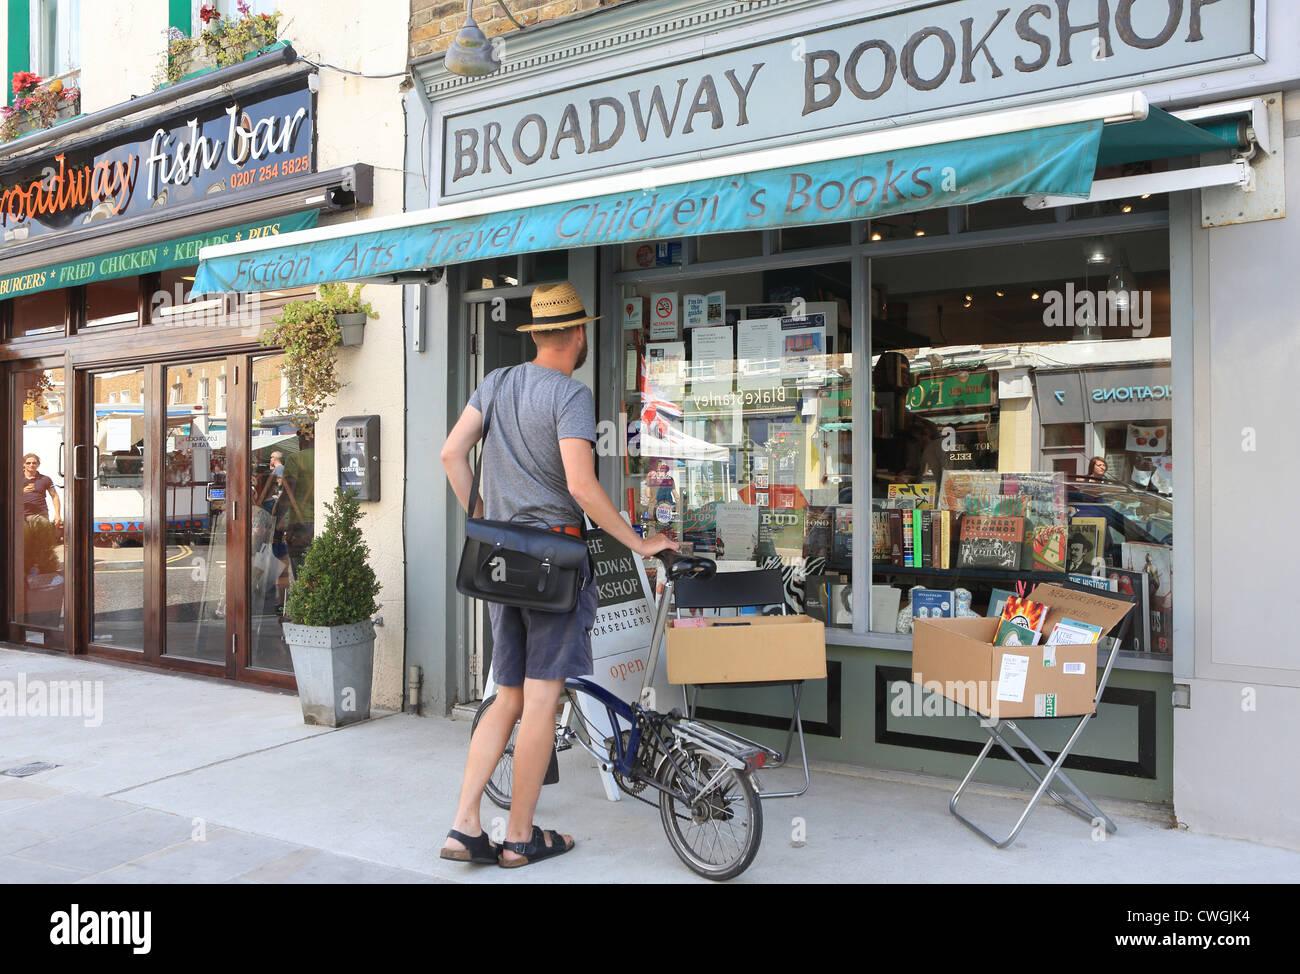 Broadway Bookshop, on trendy Broadway Market in Hackney, East London, E8, England, UK - Stock Image